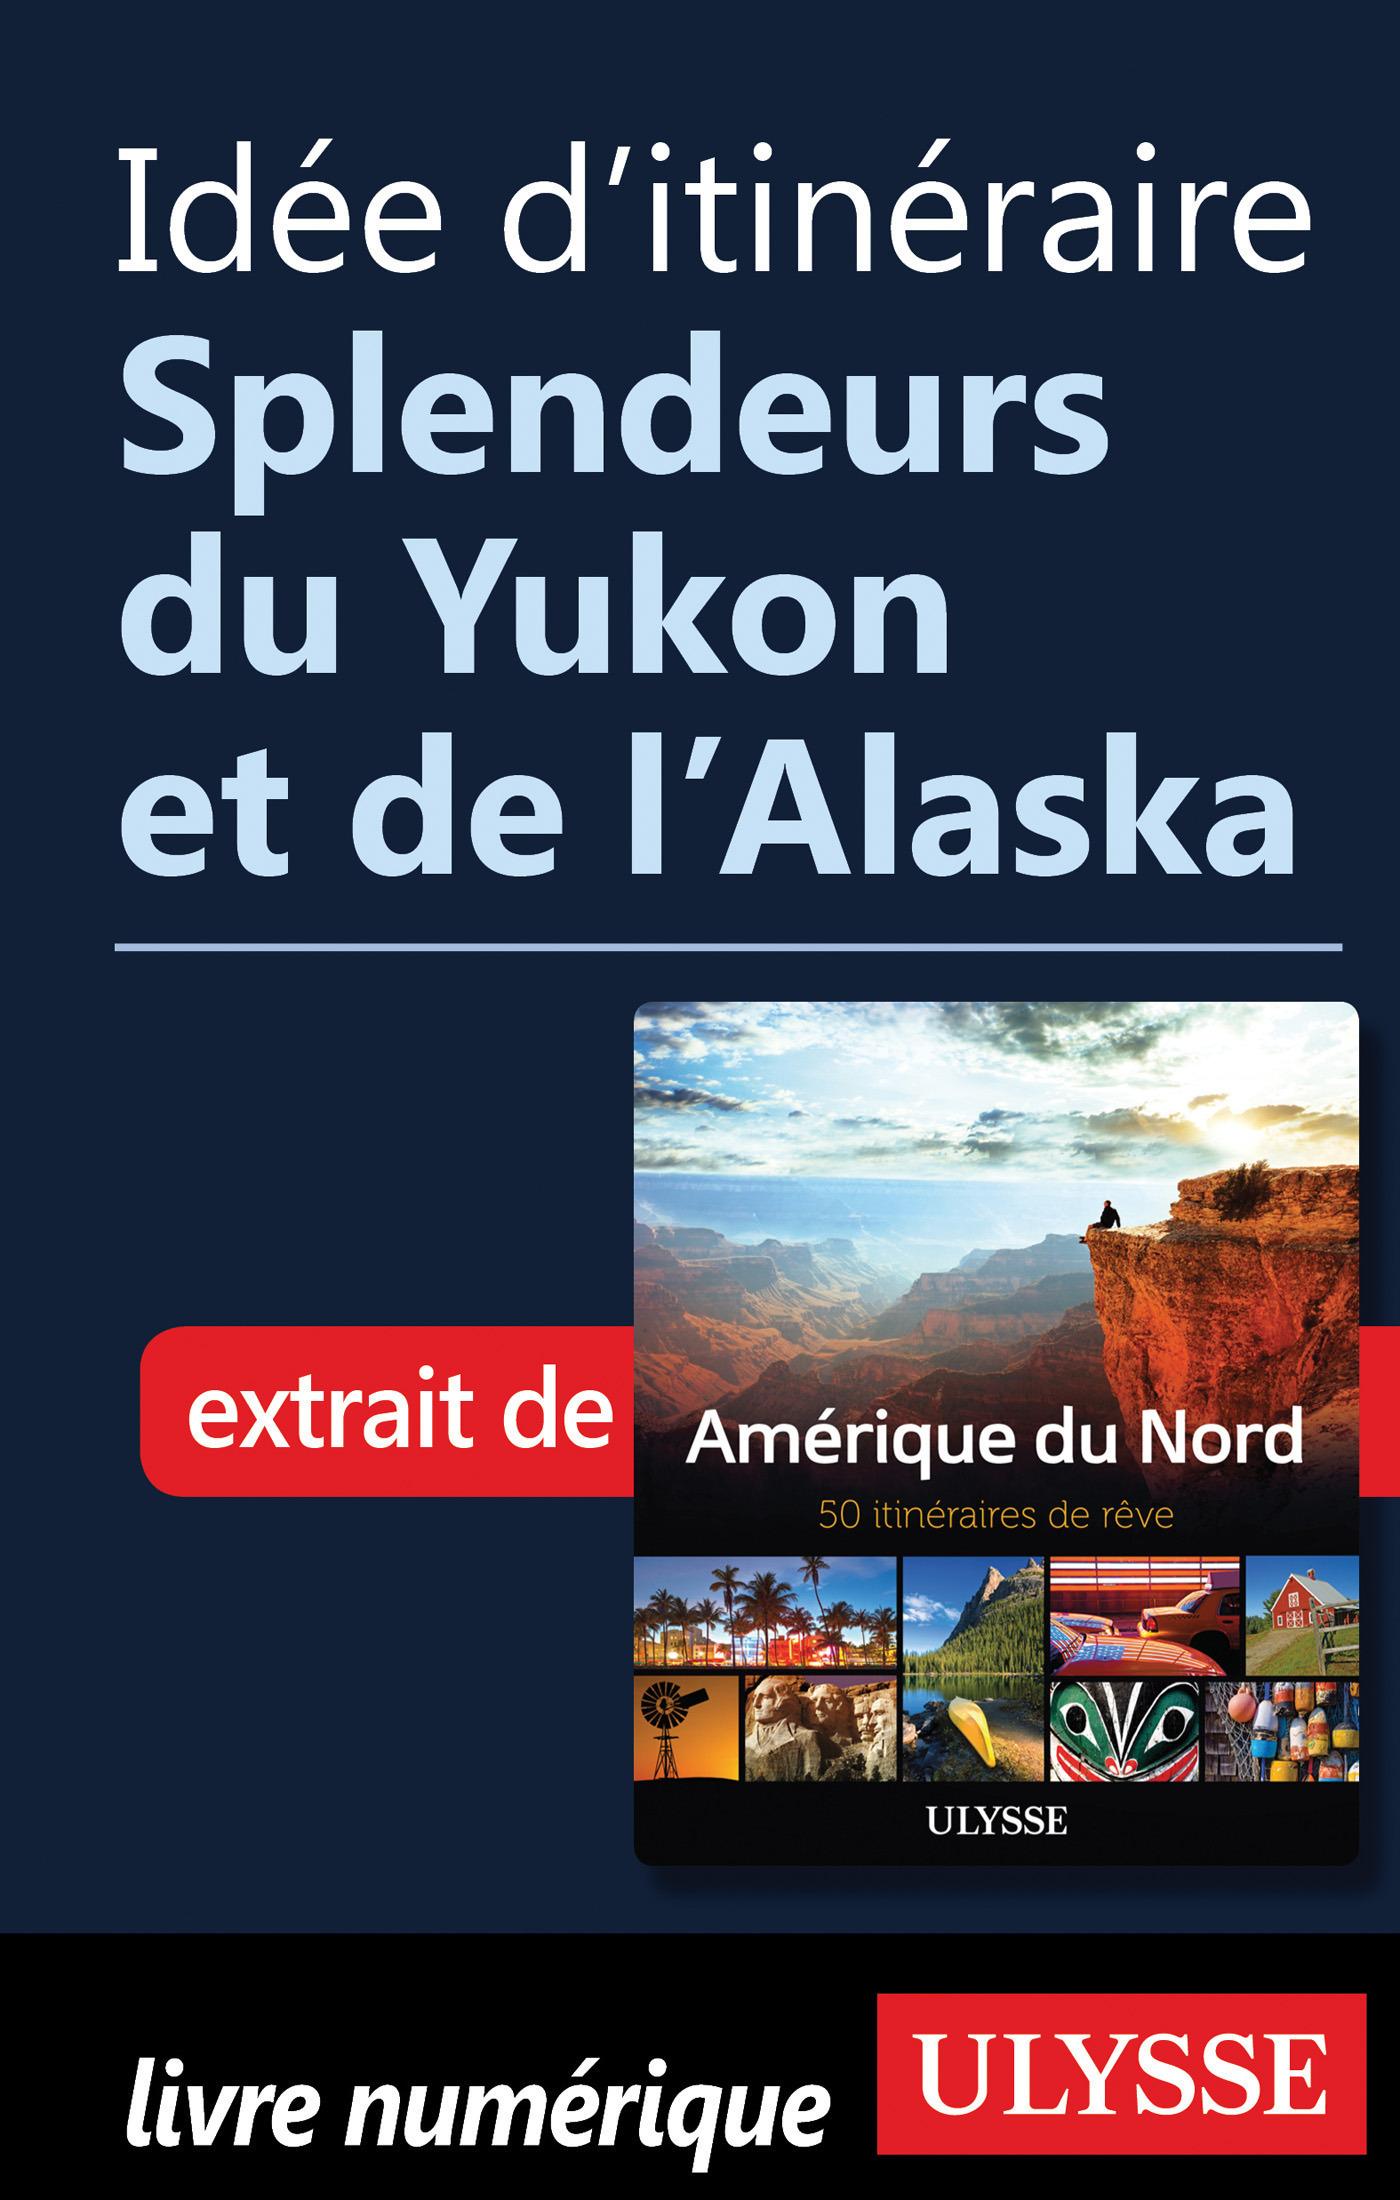 Idée d'itinéraire - Splendeurs du Yukon et de l'Alaska